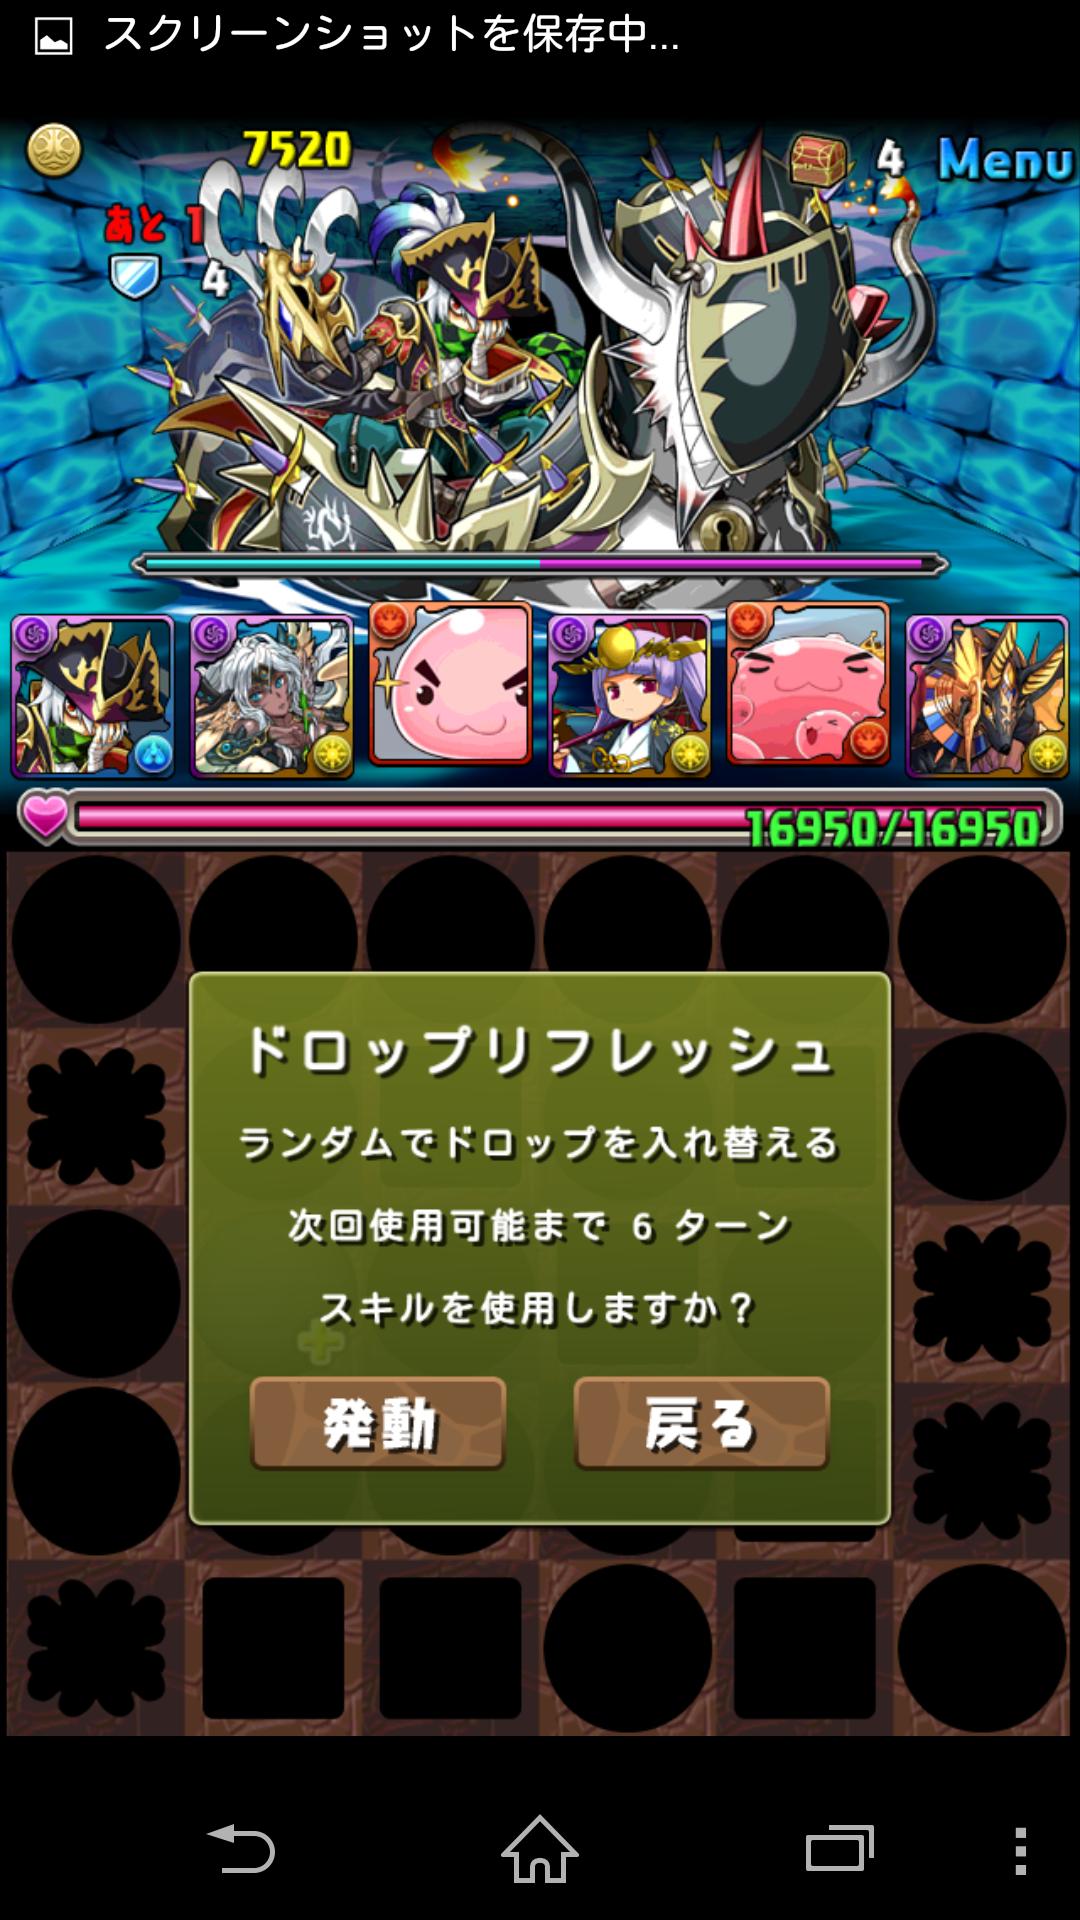 Screenshot_2014-08-27-23-01-17.png